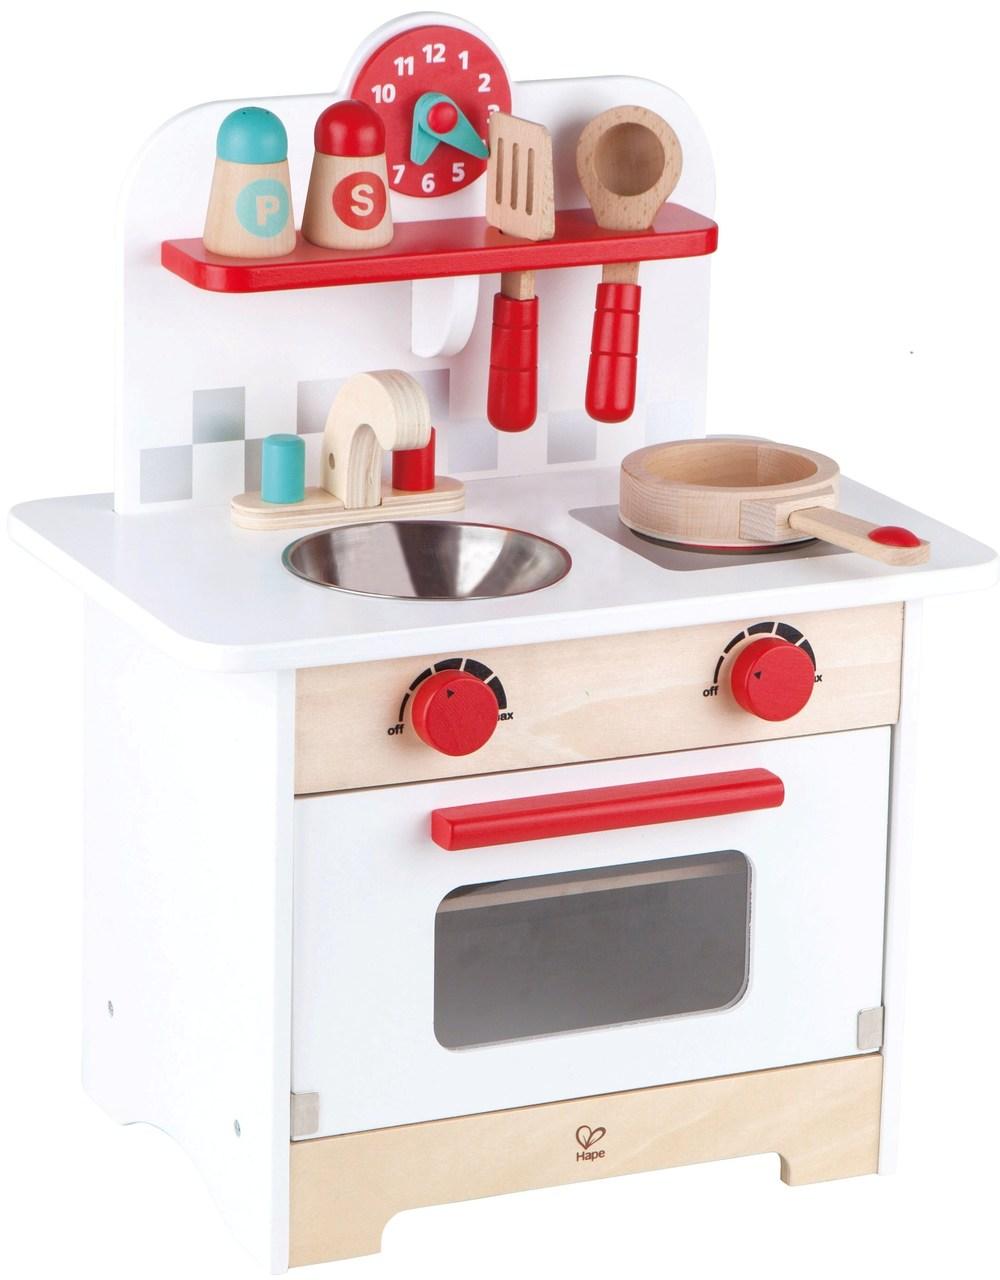 Hape Mini Retro Kitchen on Sale! | Play Food & Kids Kitchen Sets